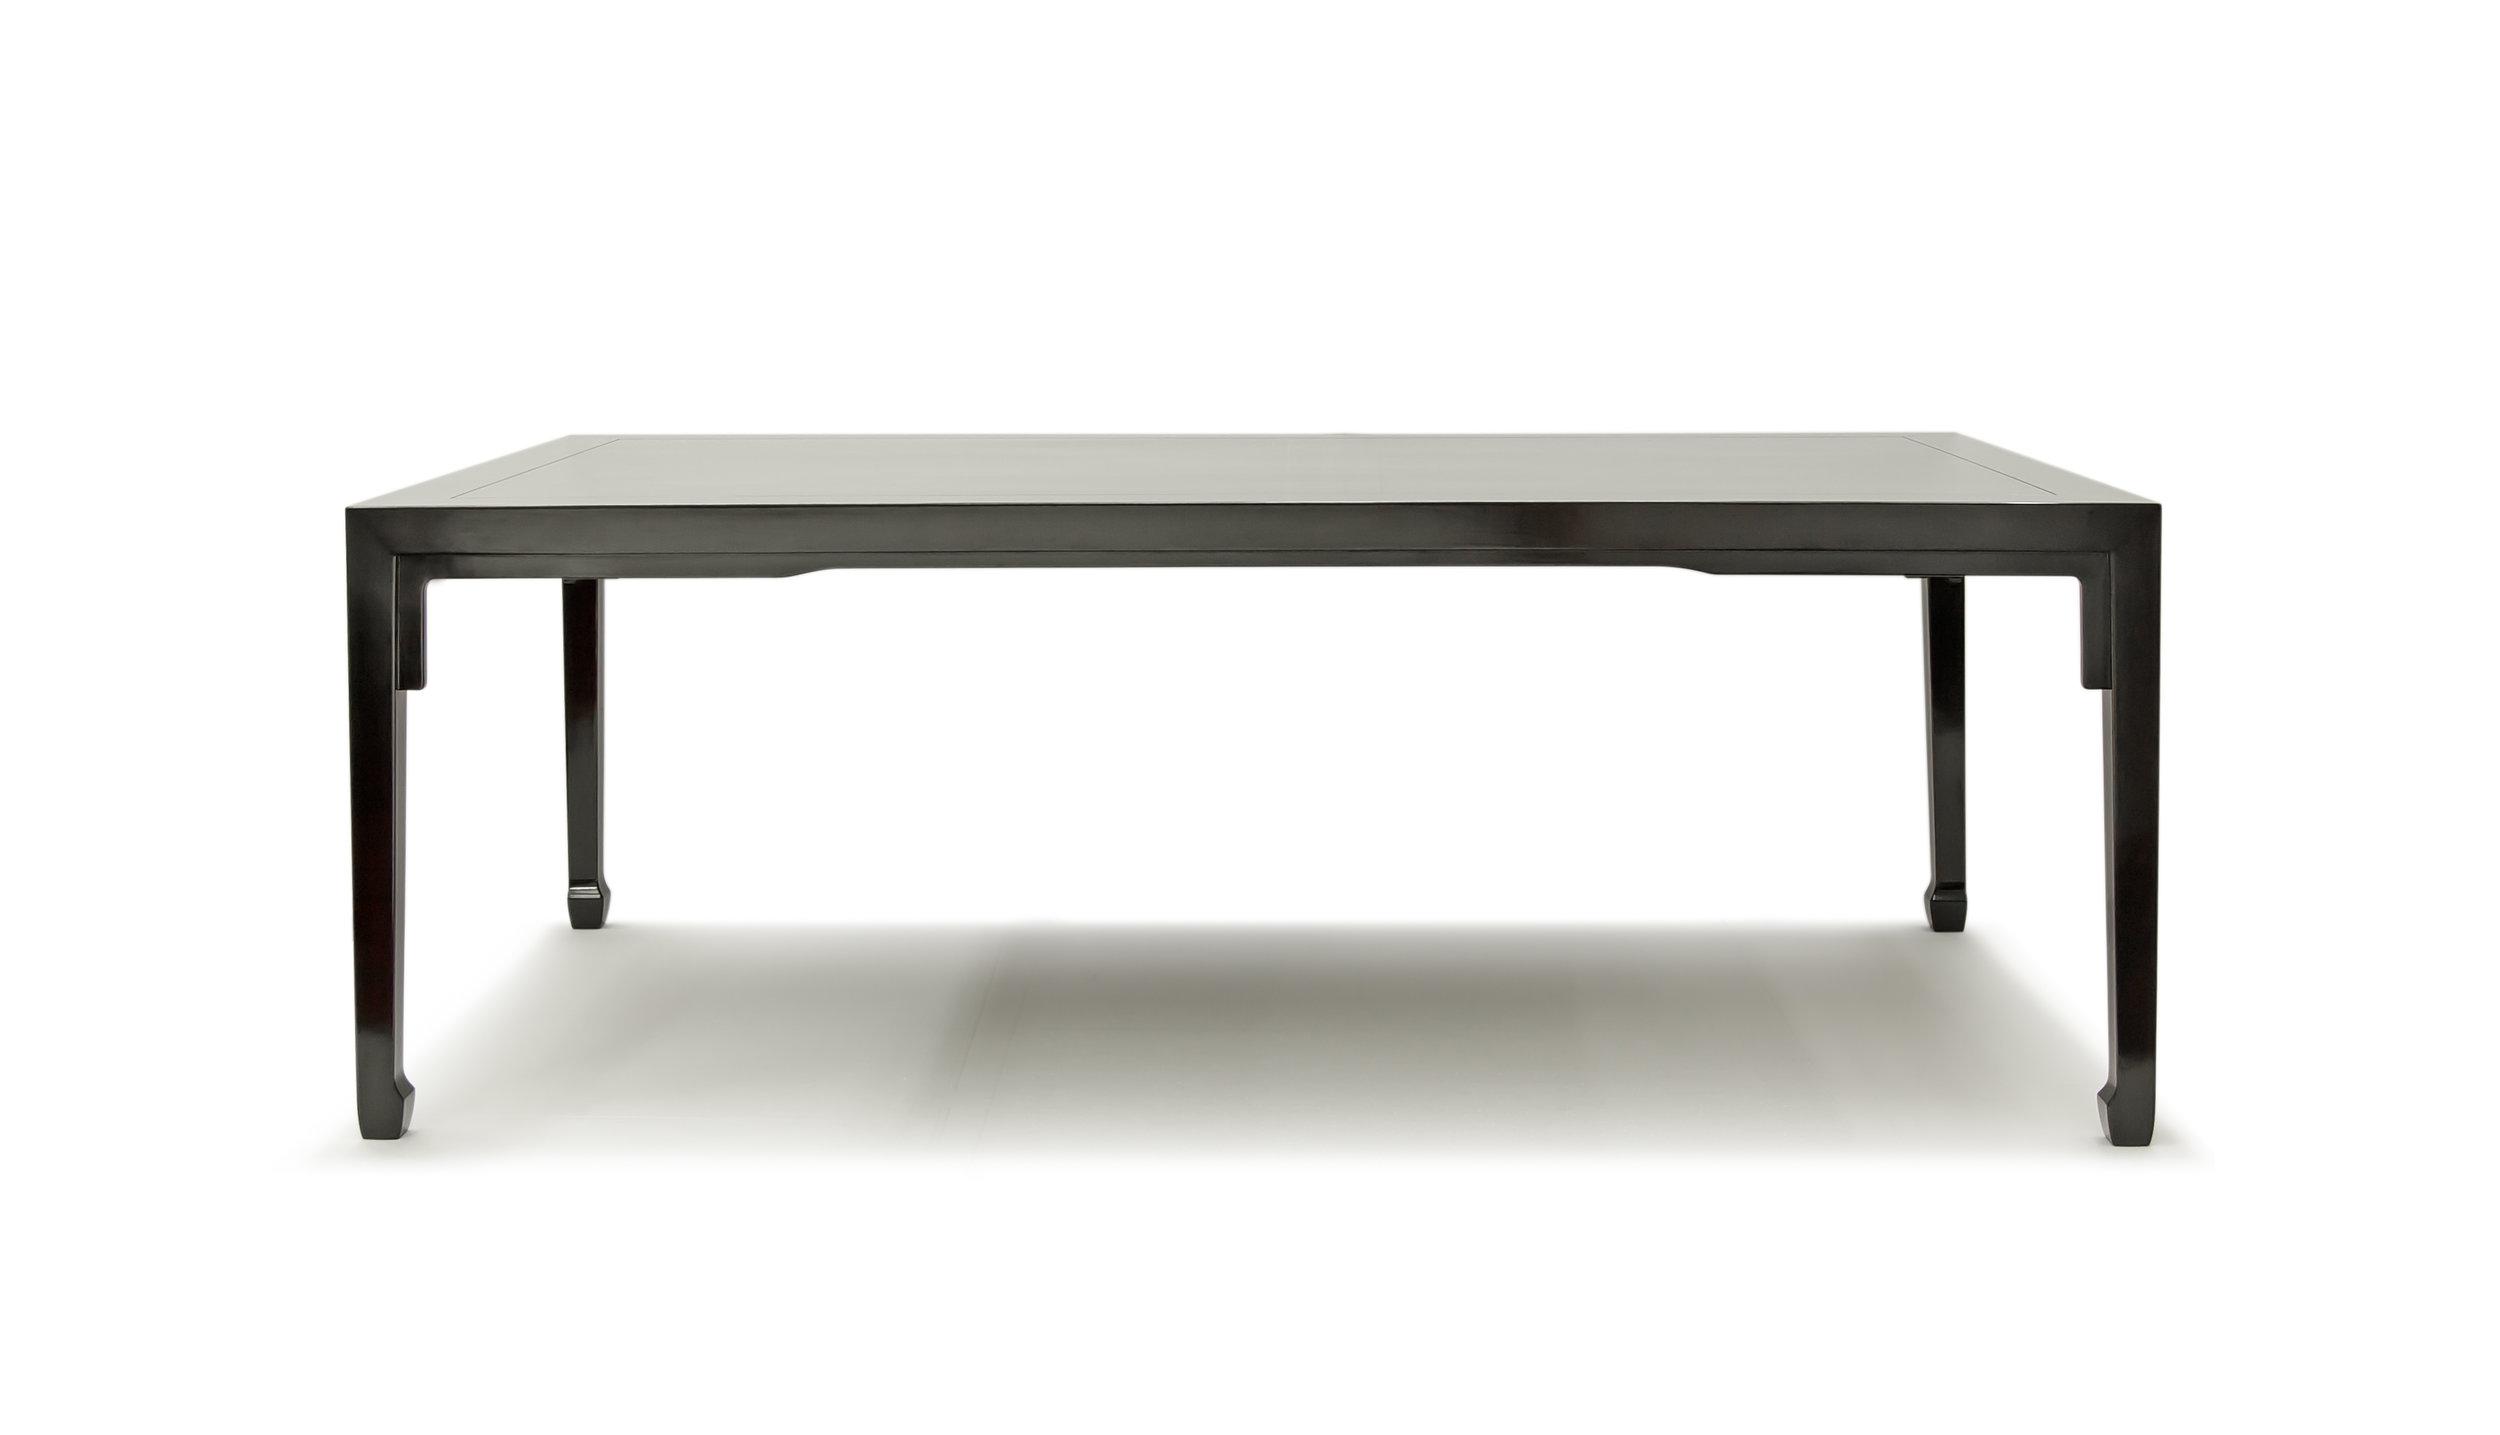 ....bespoke chinese ming style furniture : big desk..特别定制中式明式家具 : 大书台....